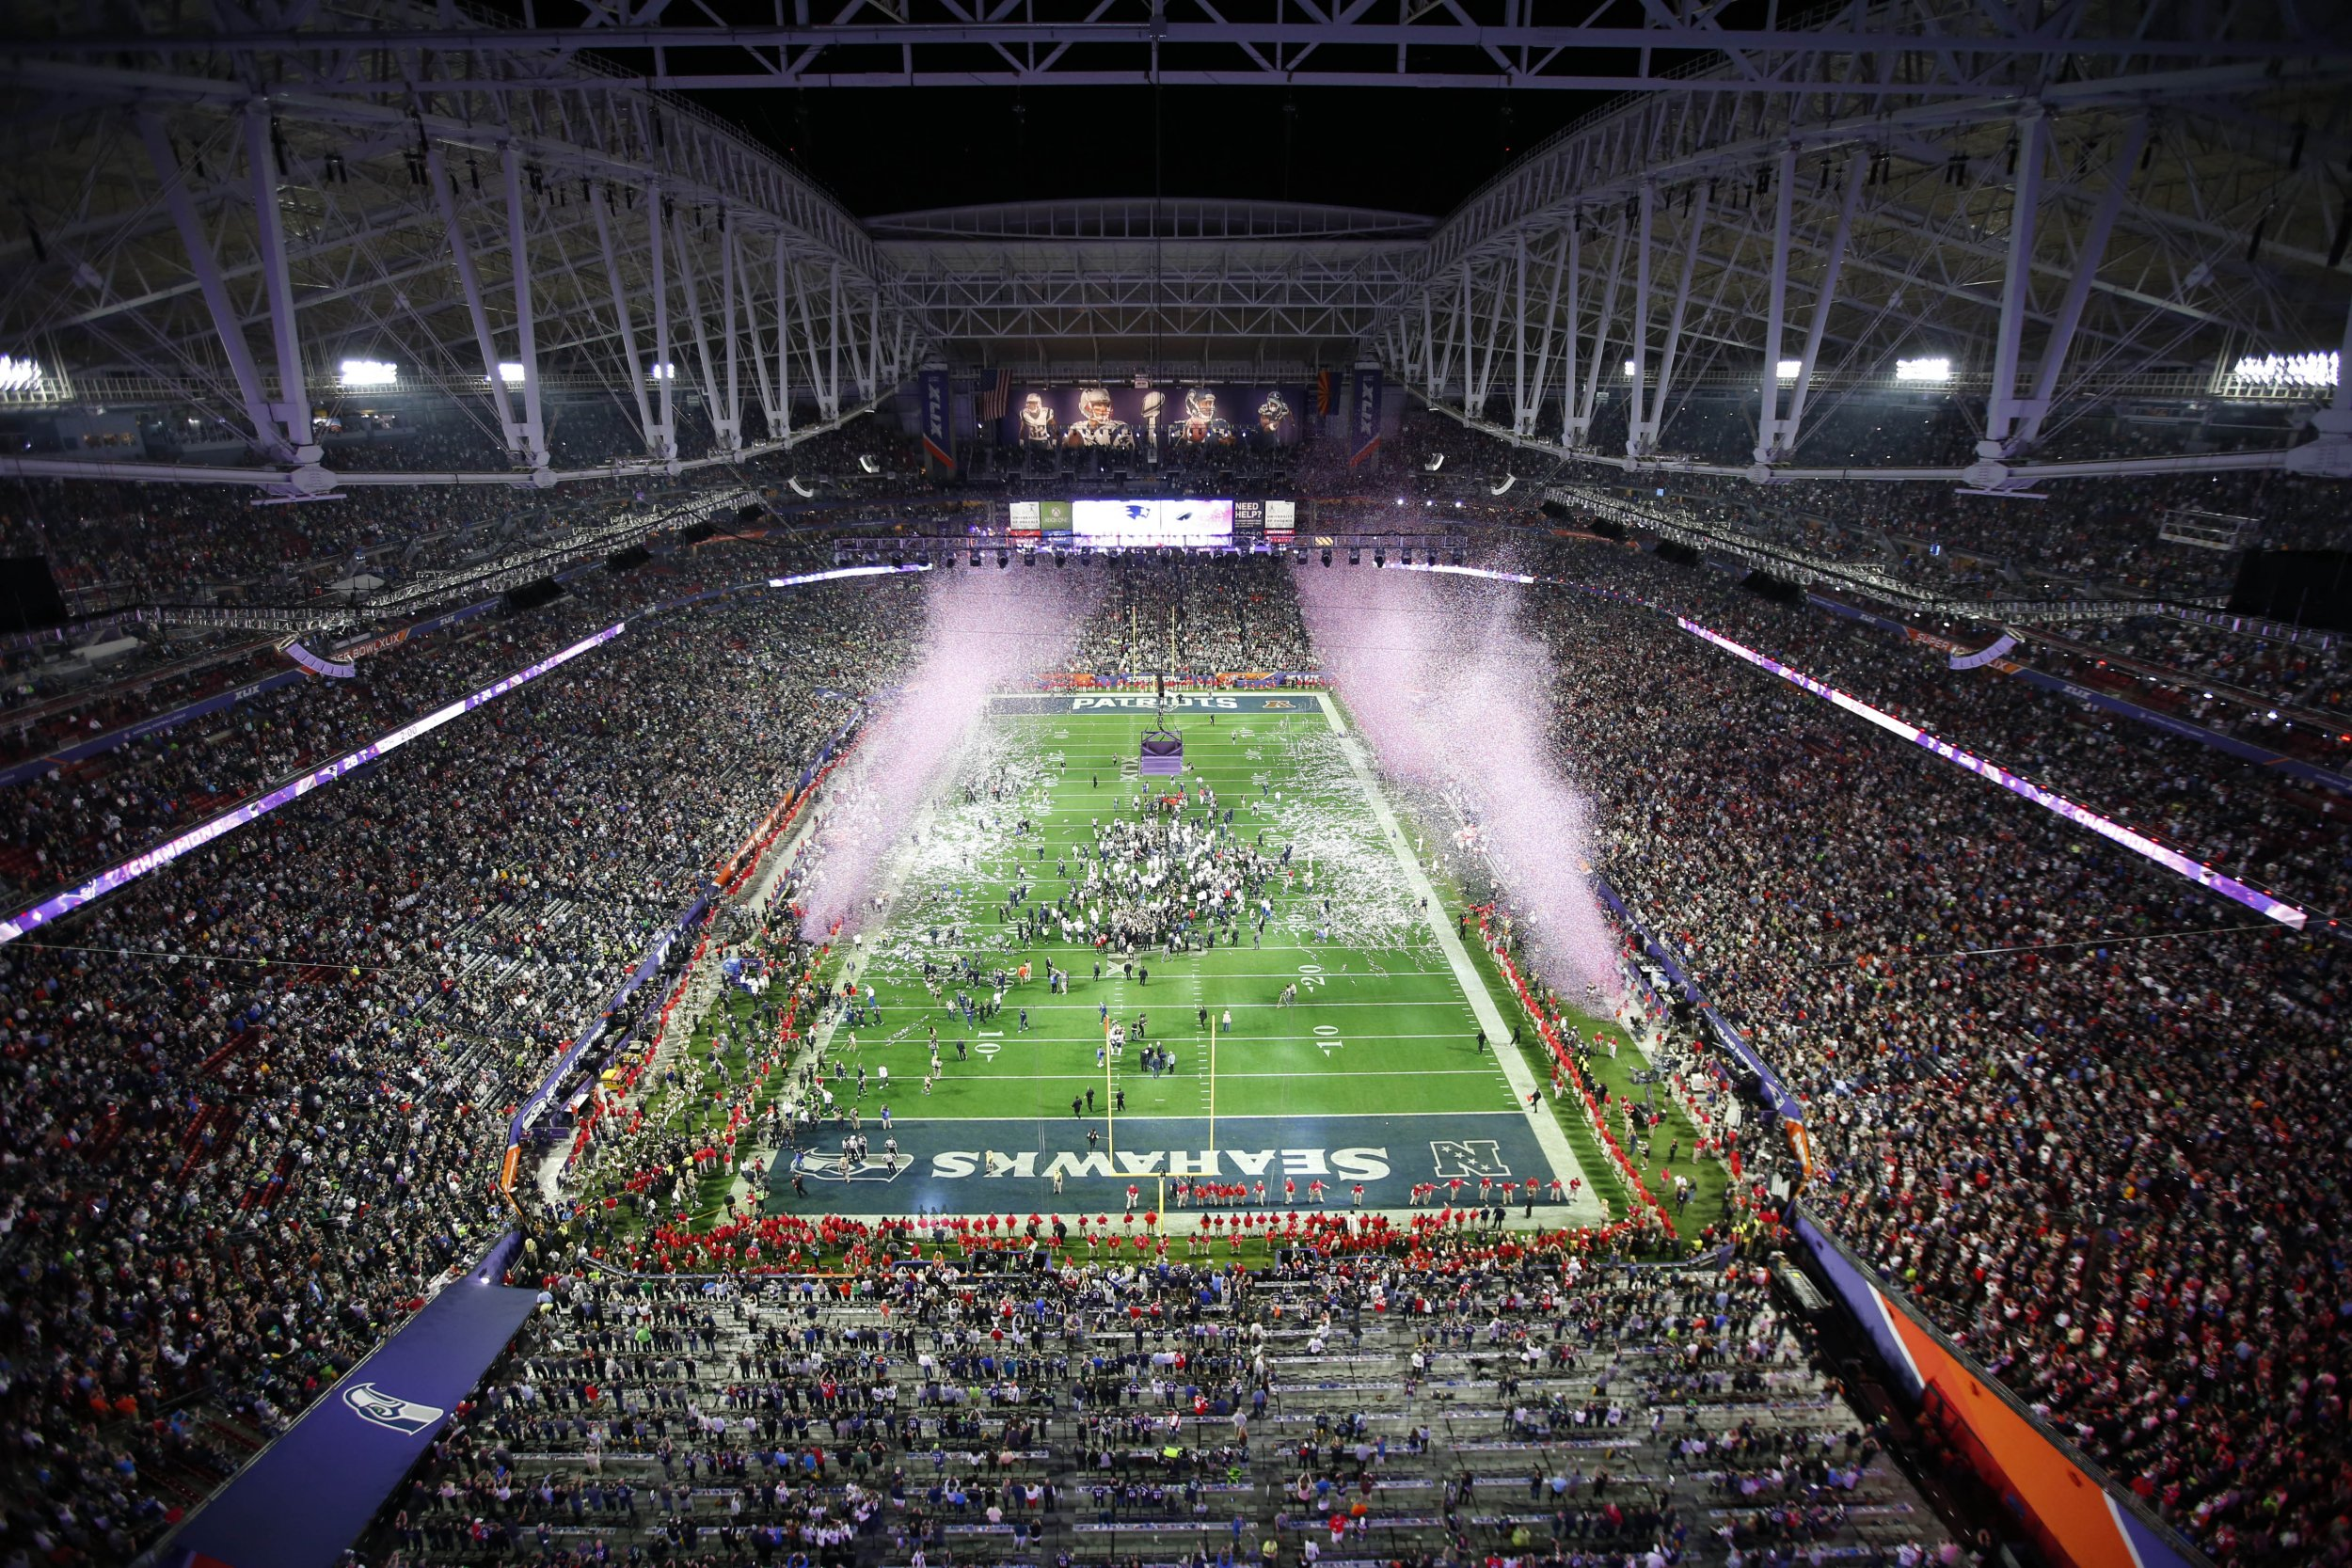 Patriots Wallpaper Hd Super Bowl Wisdom Seahawks Coach Pete Carroll At His Best